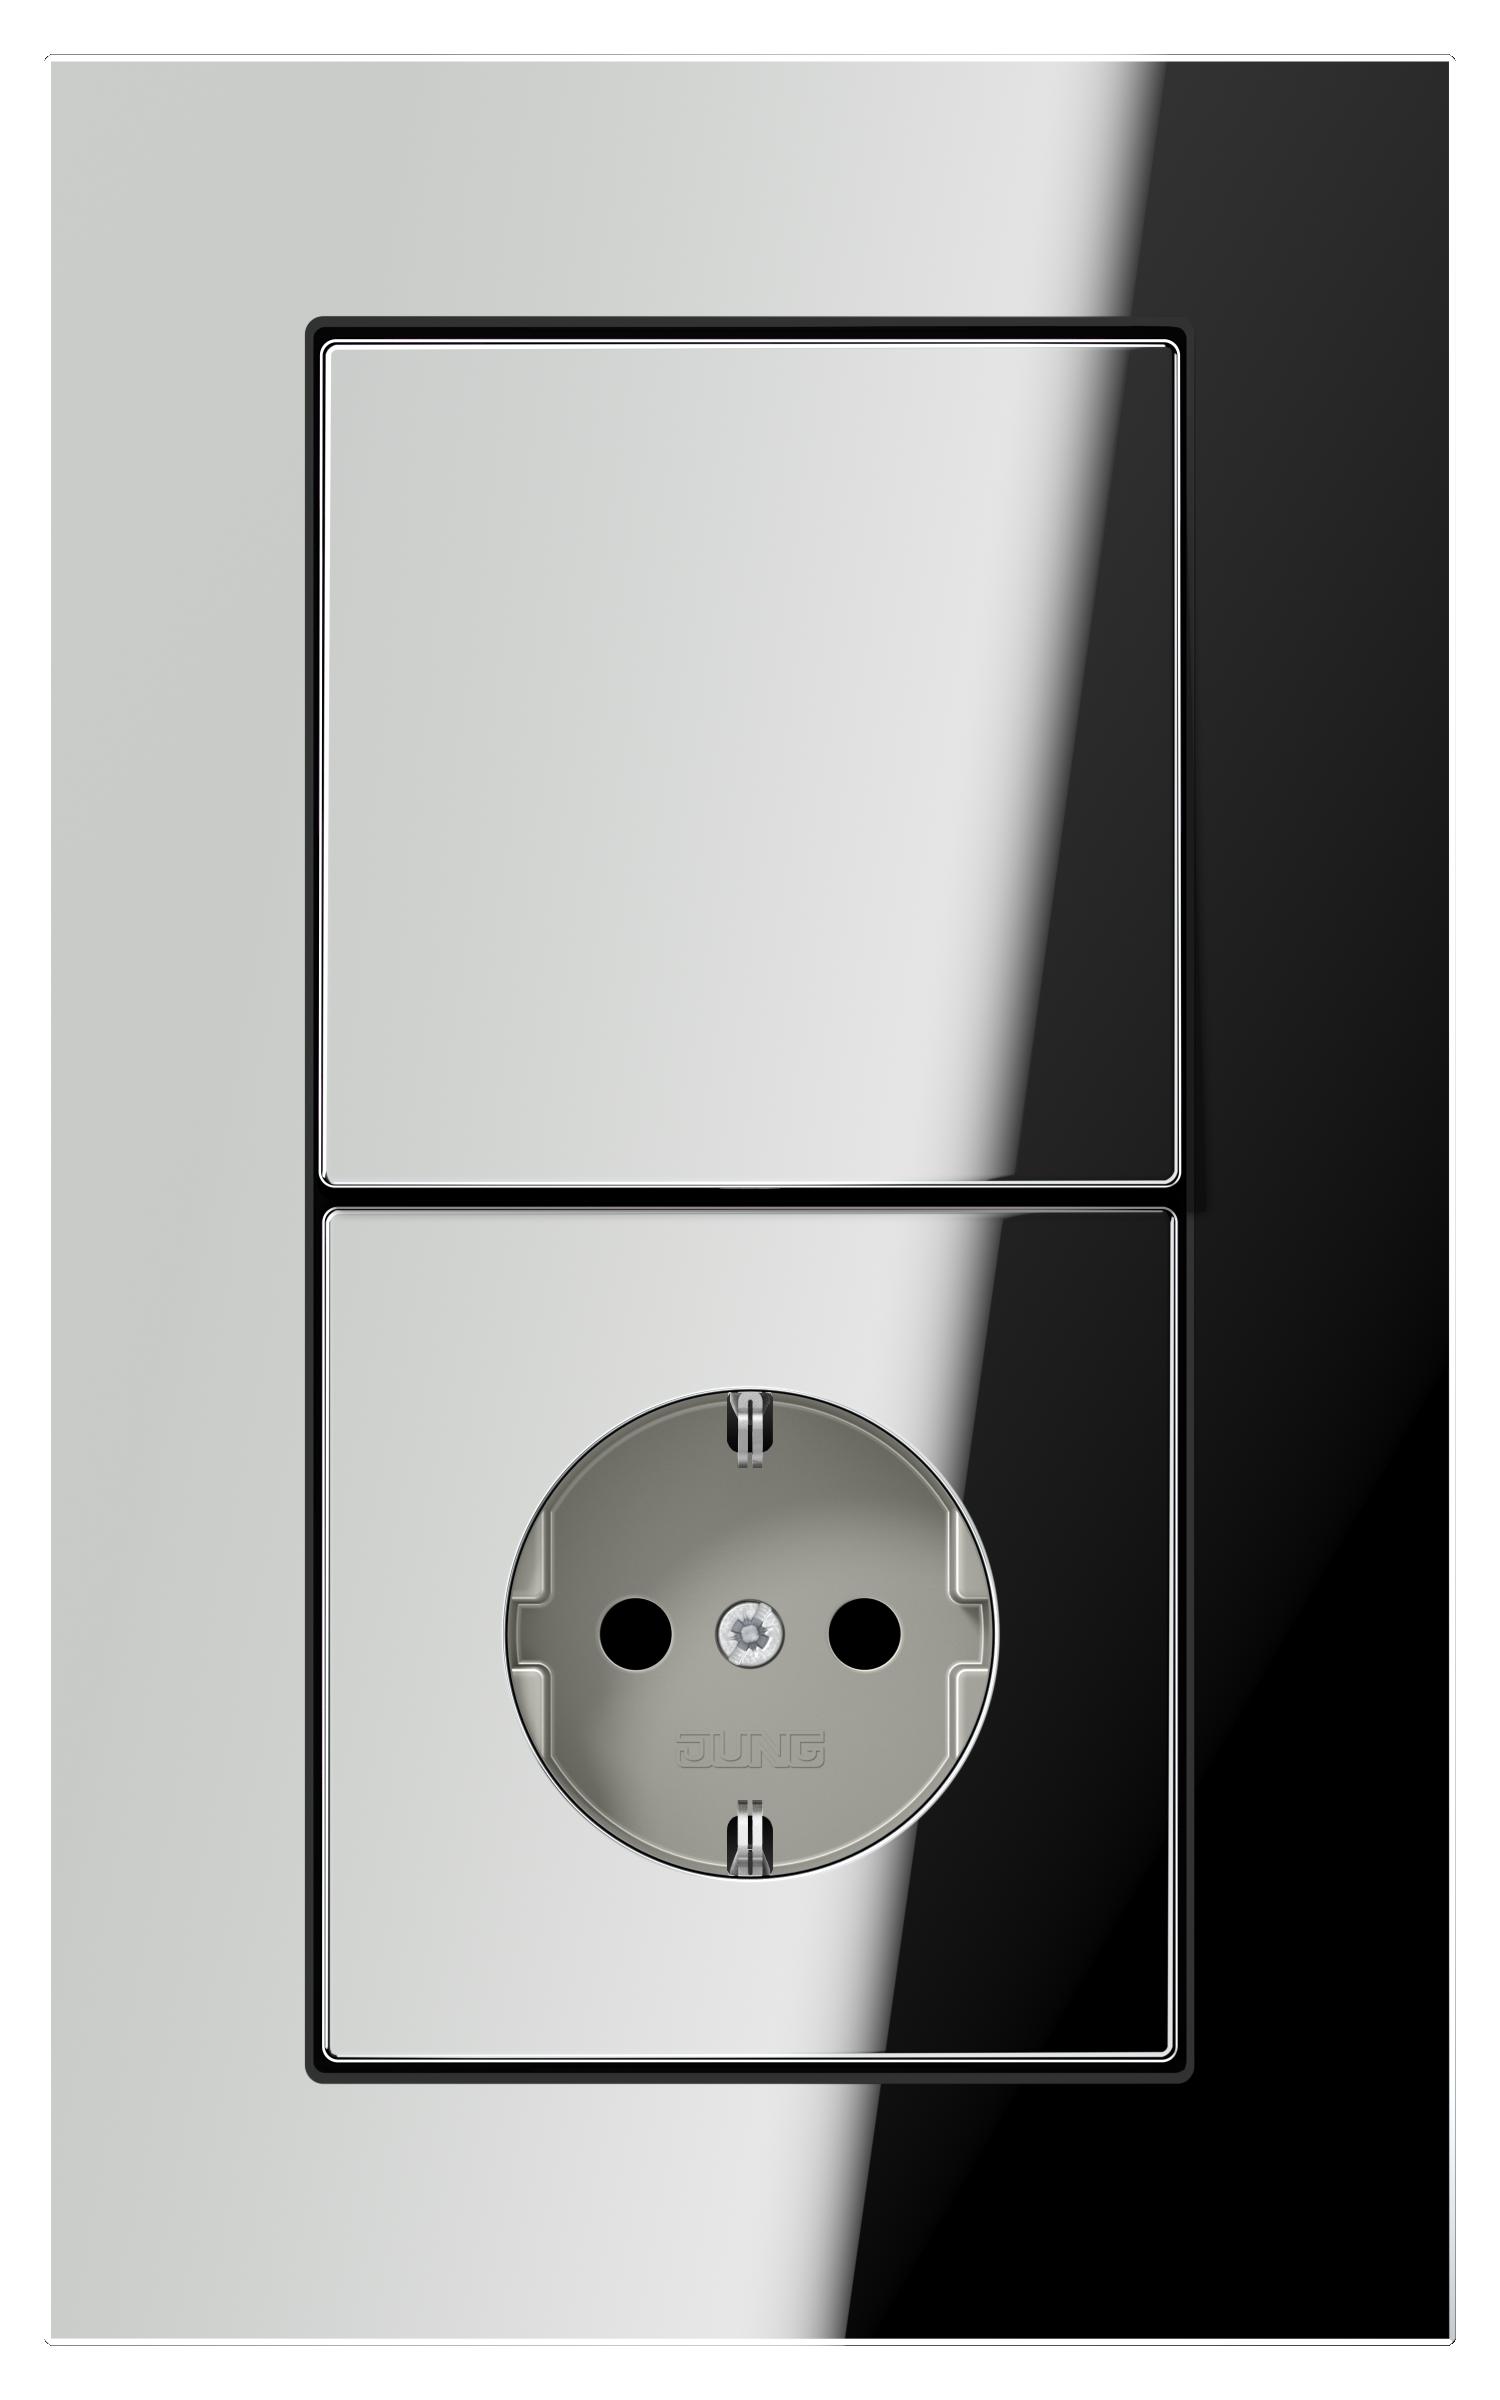 JUNG_LS_plus_chrome_switch-socket